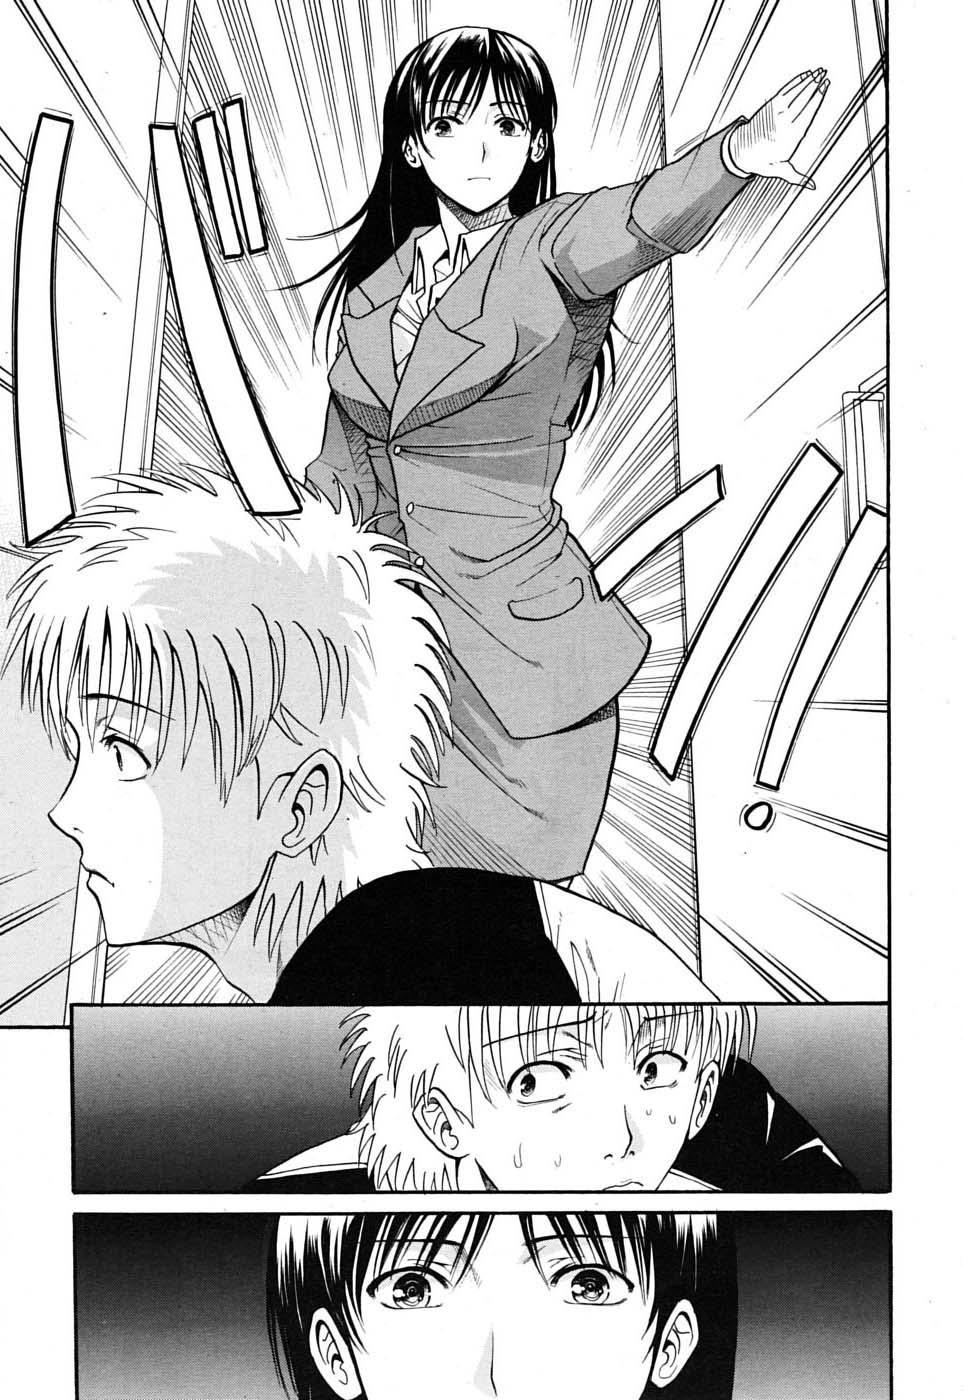 Otonari-san to no Shojijou | Secret Fling with the Neighbor 4